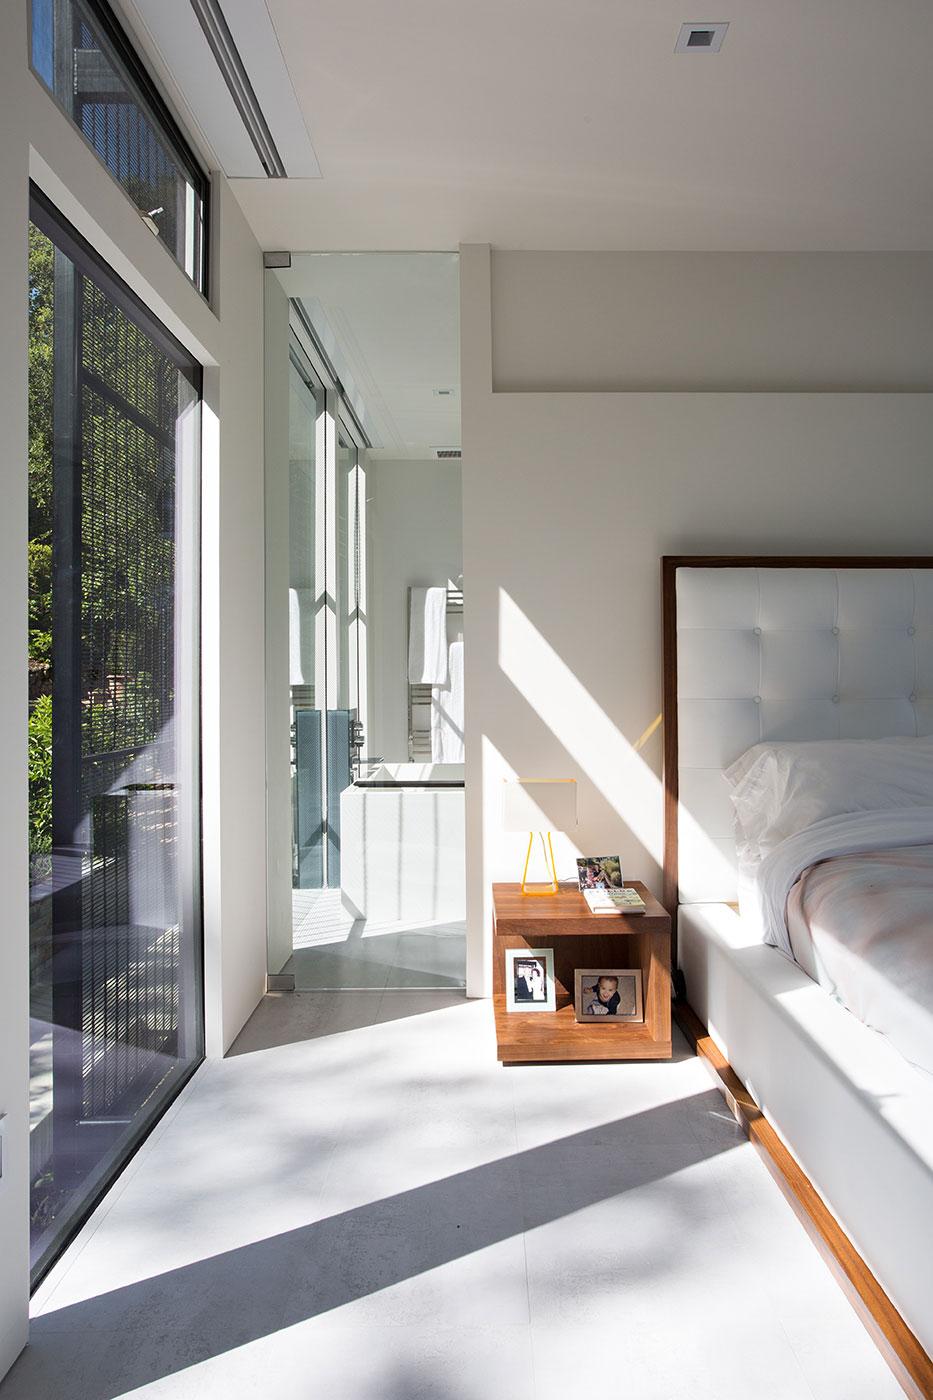 Minimal Modern Addition Home with Dark Grey Stuccoed Walls by Klopf Architecture-15